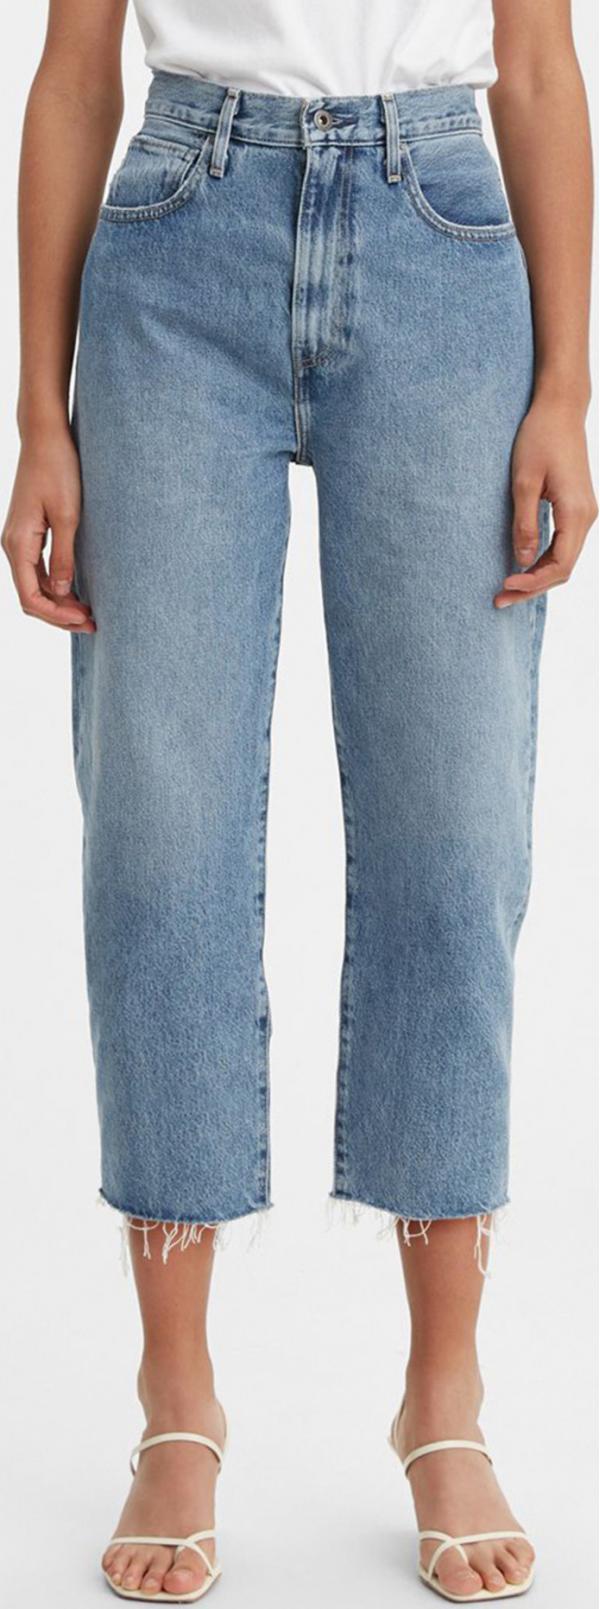 Lmc Barrel Lmc Palm Blues Jeans Levi